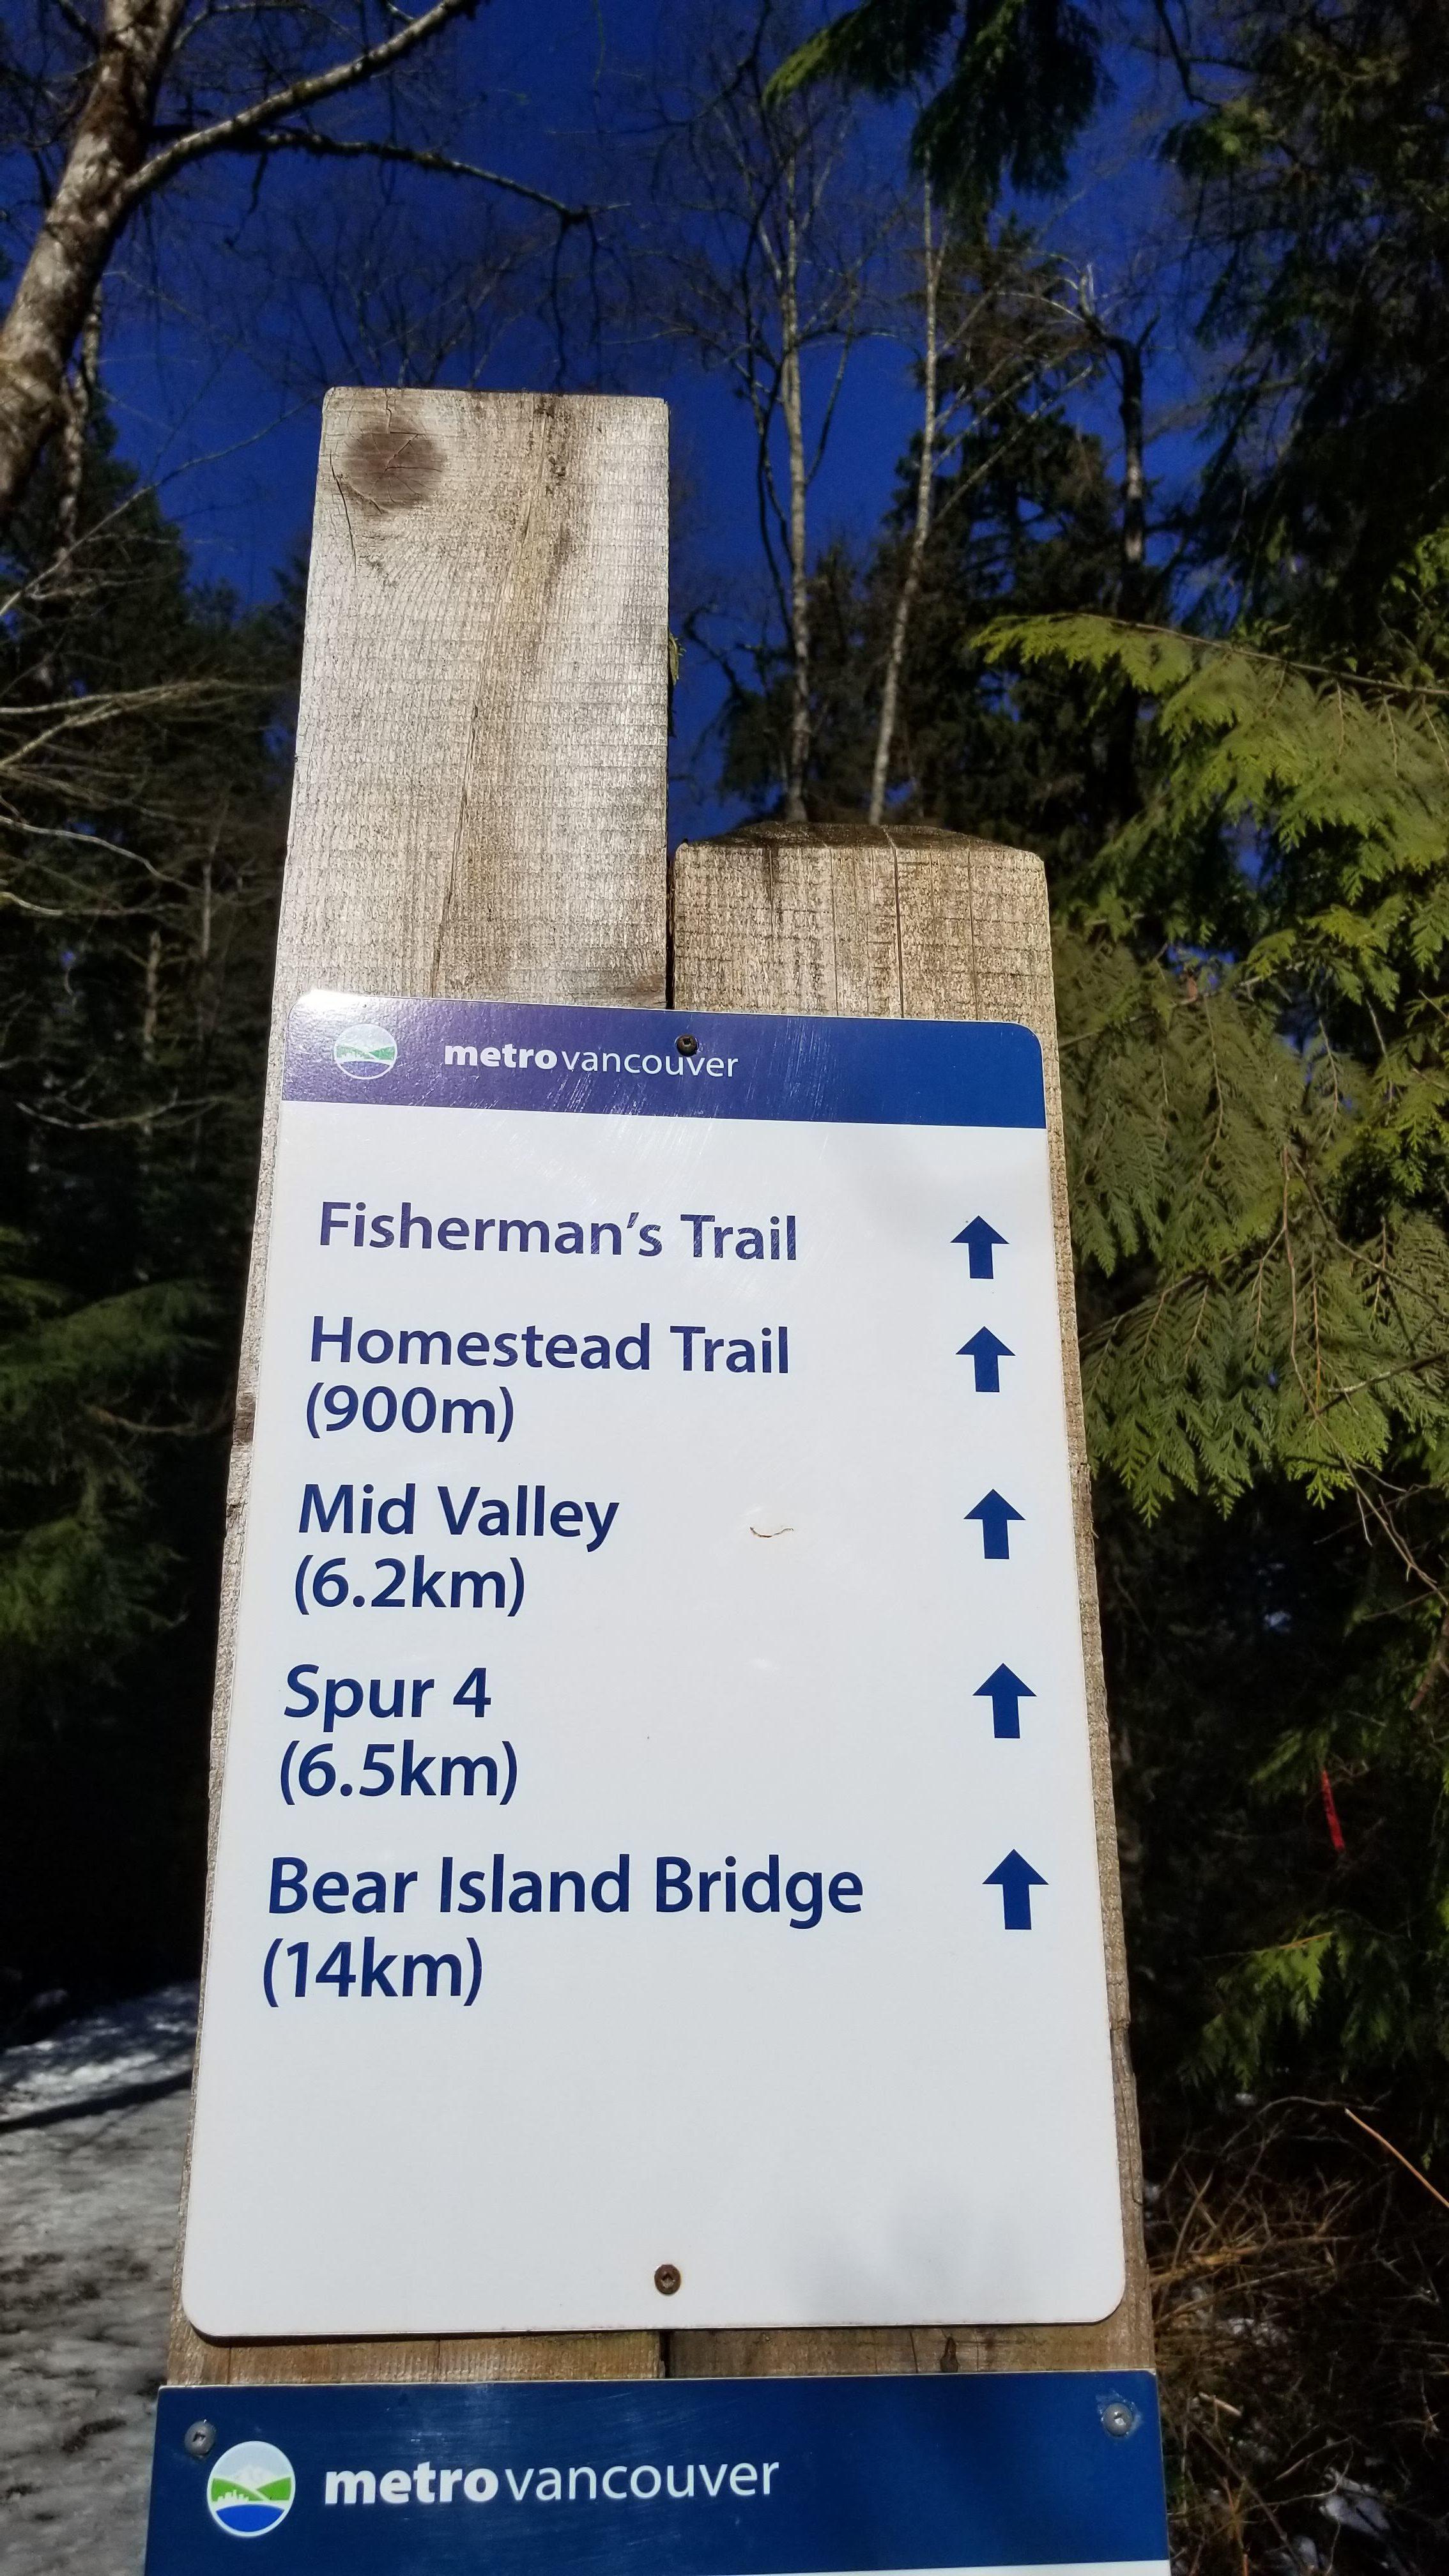 metro vancouver, hiking trail, trail sign, fisherman's trail